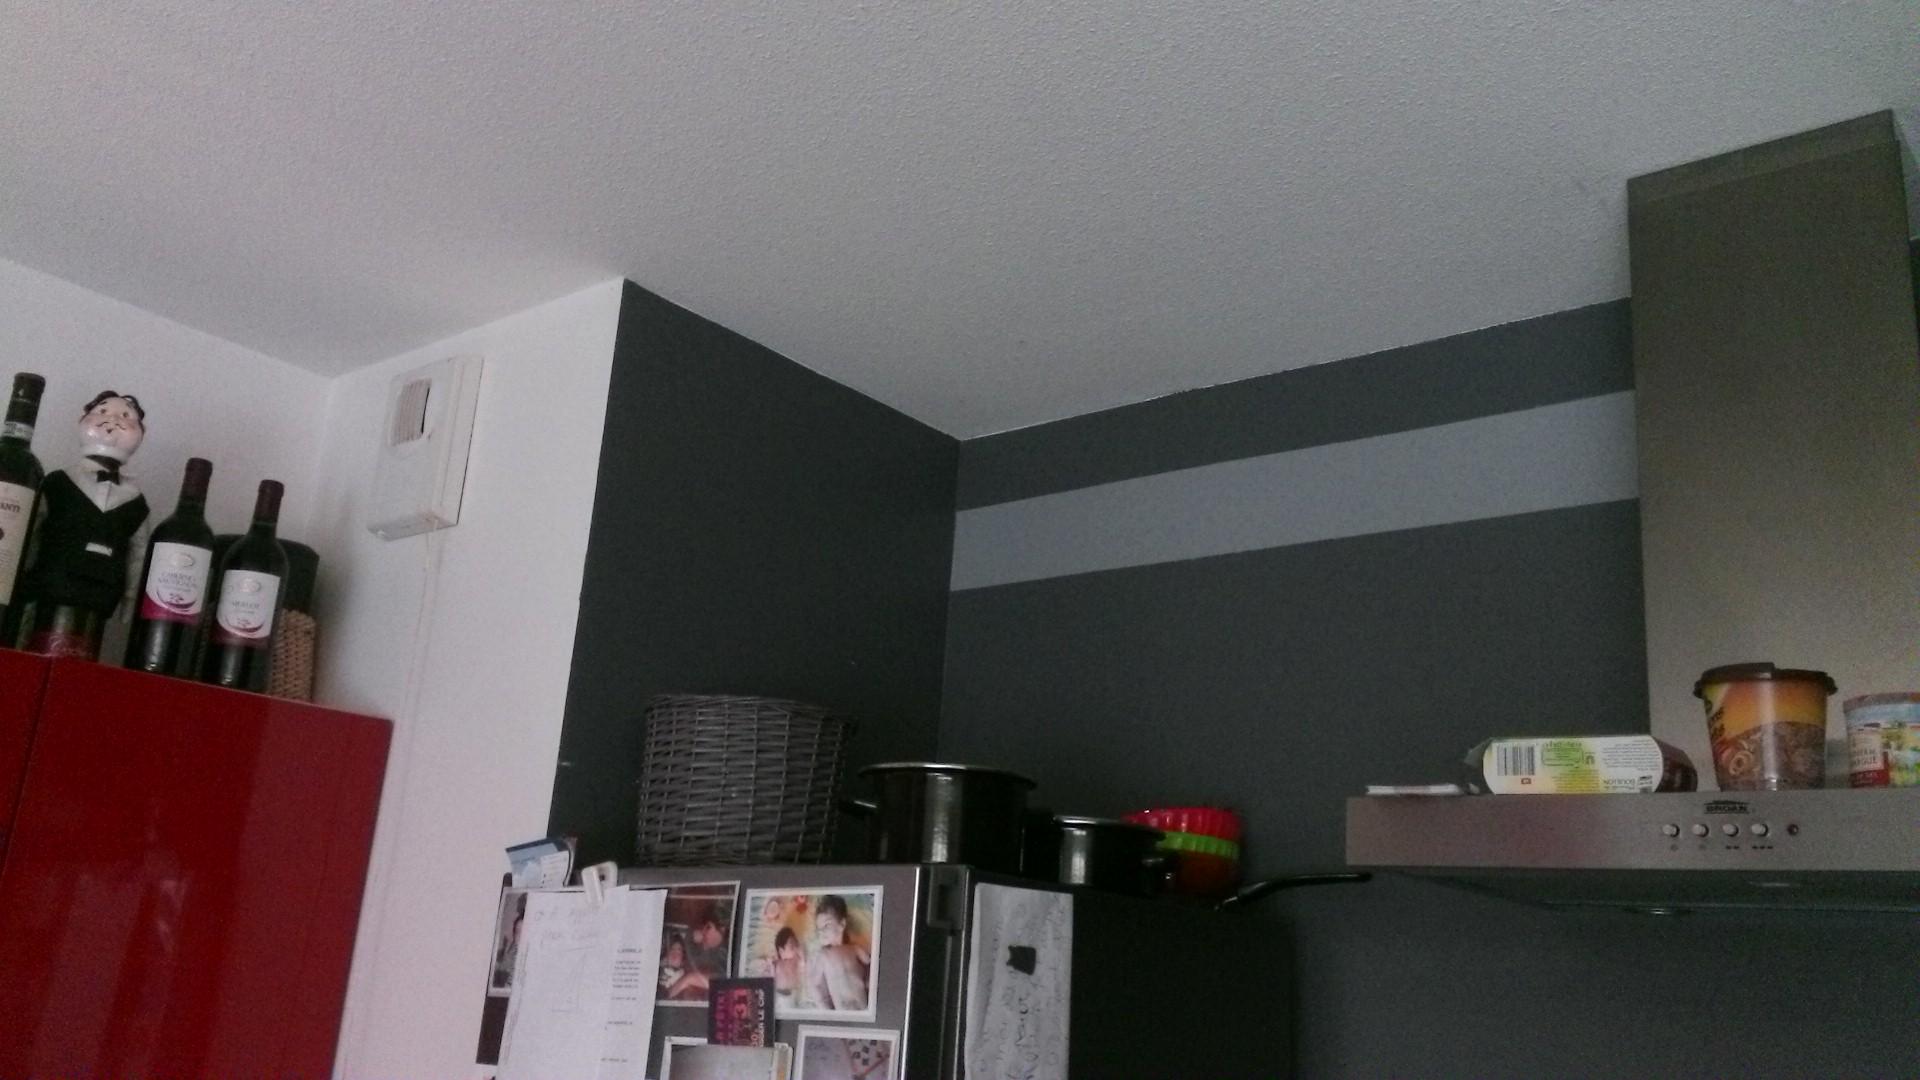 Design folie cuisine for Peinture cuisine gris clair